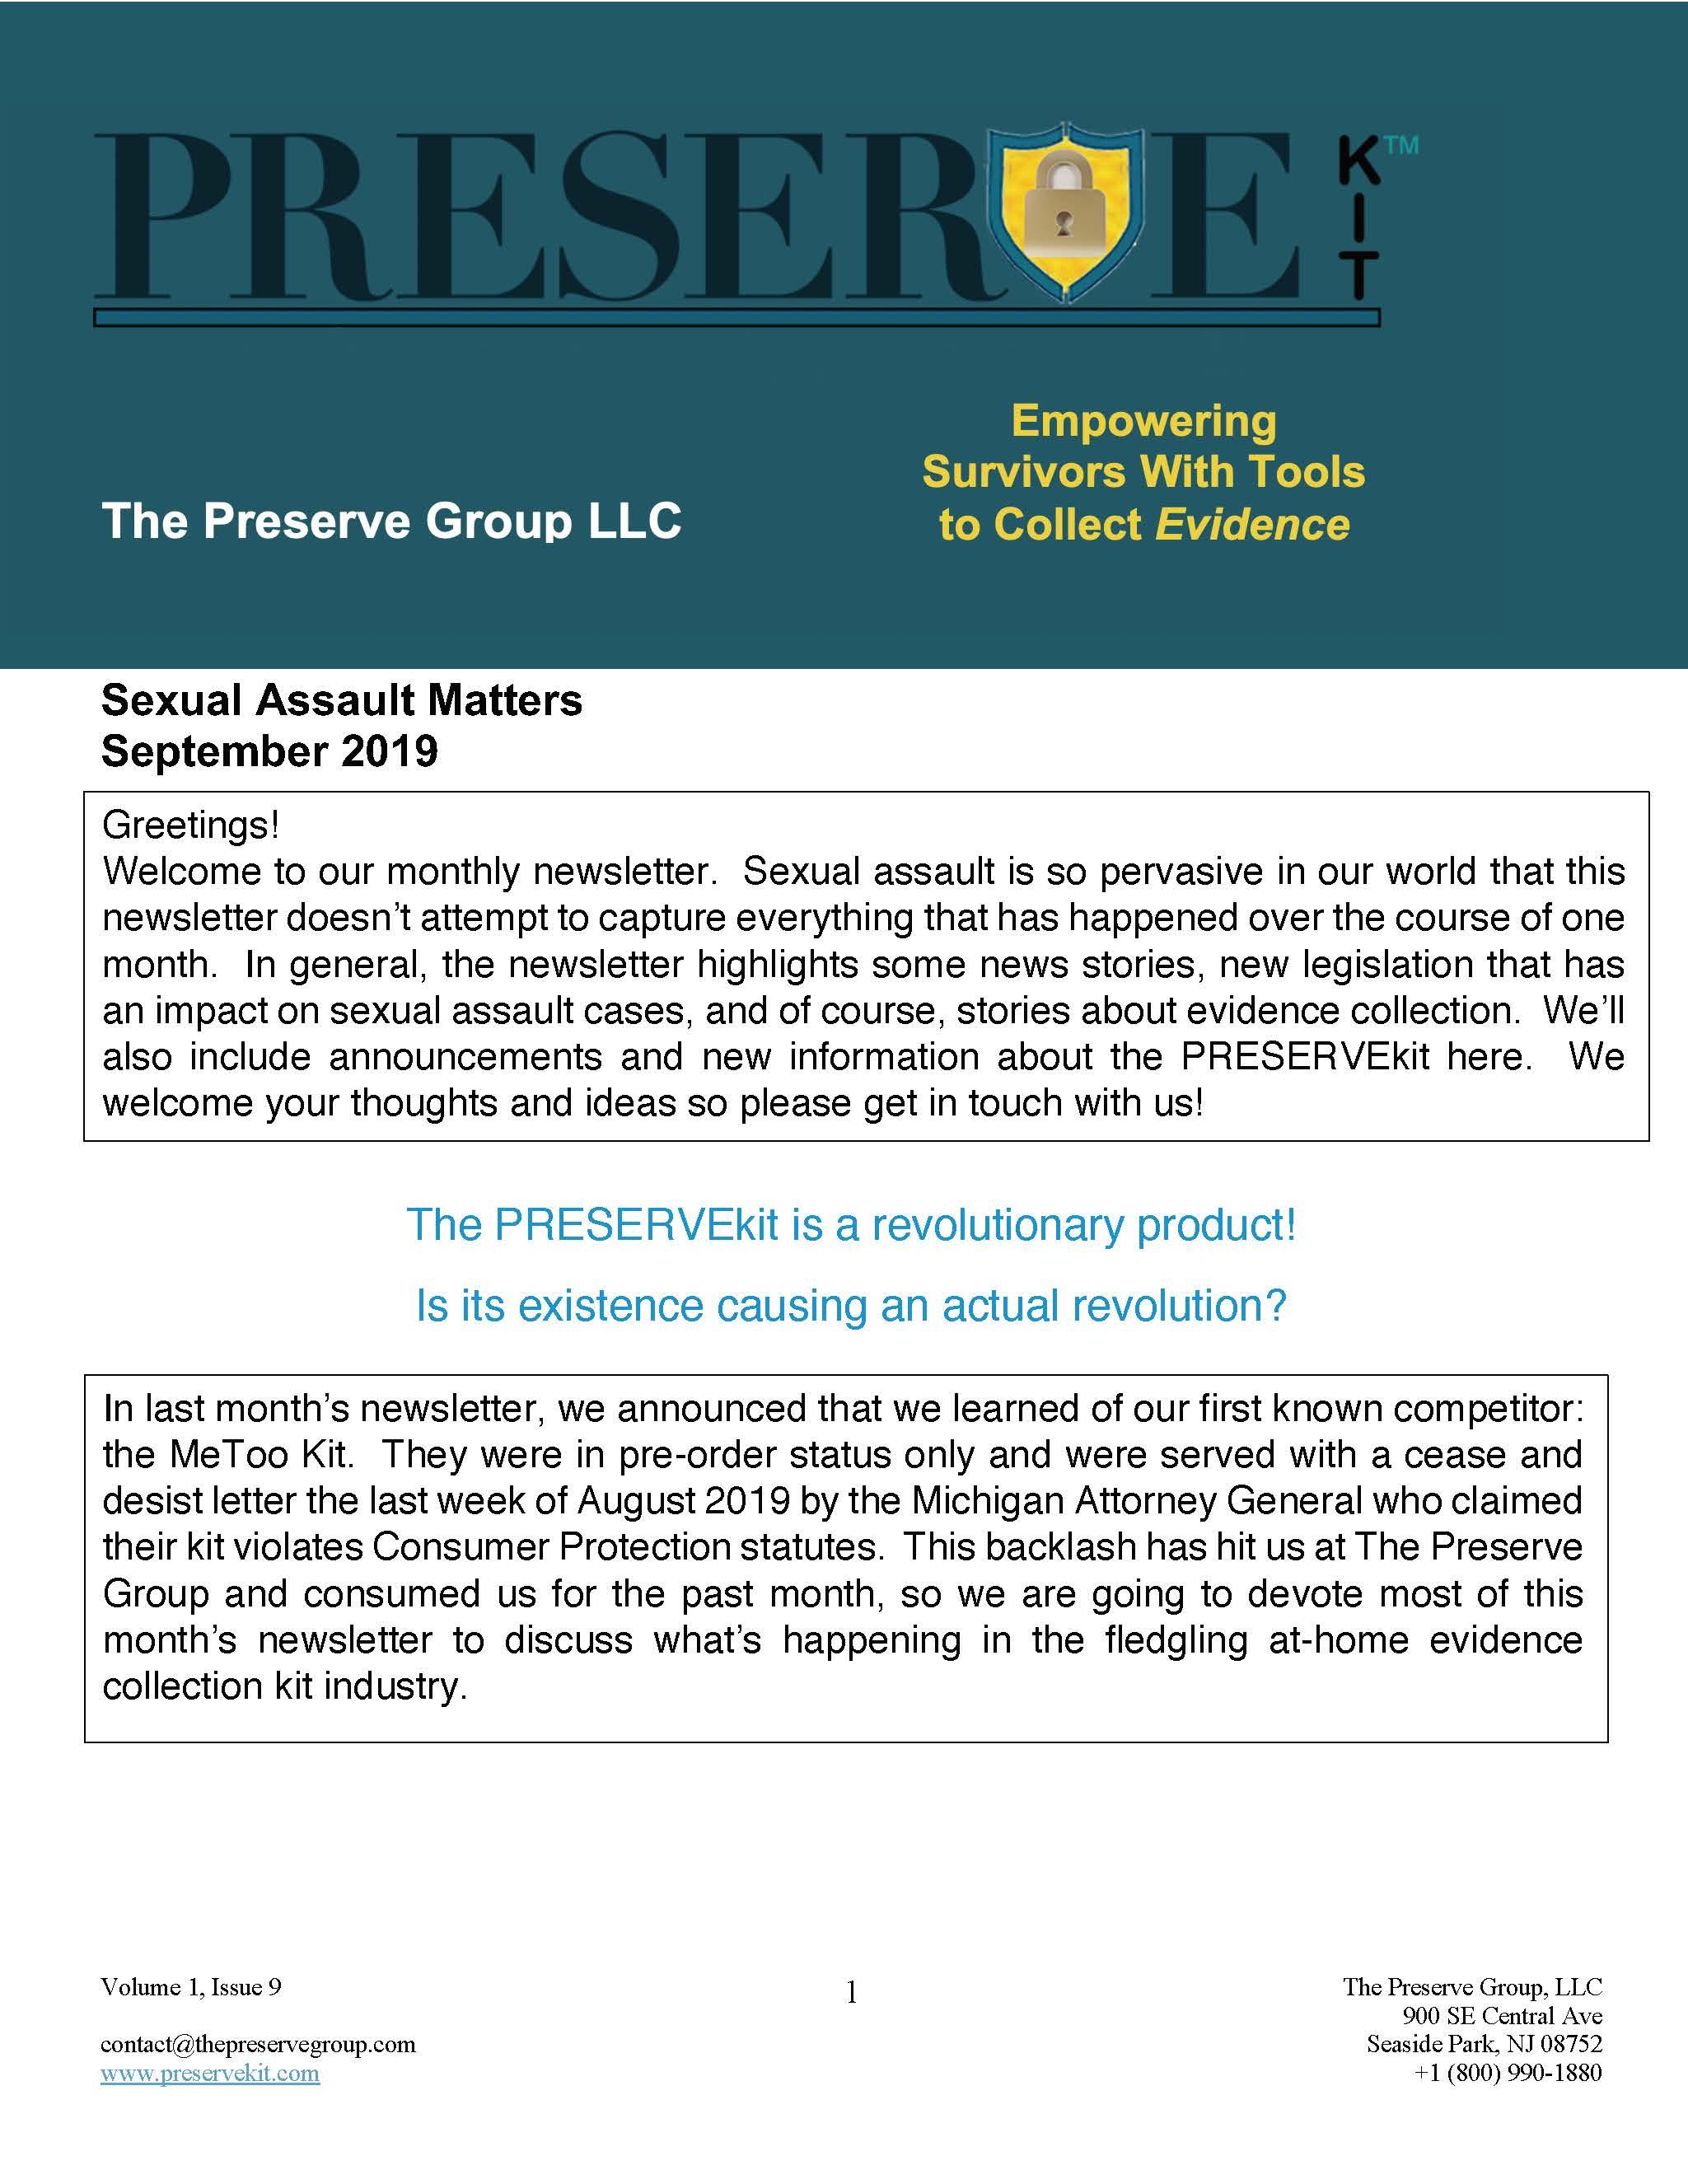 September 2019 Monthly Newsletter_Page_1.jpg